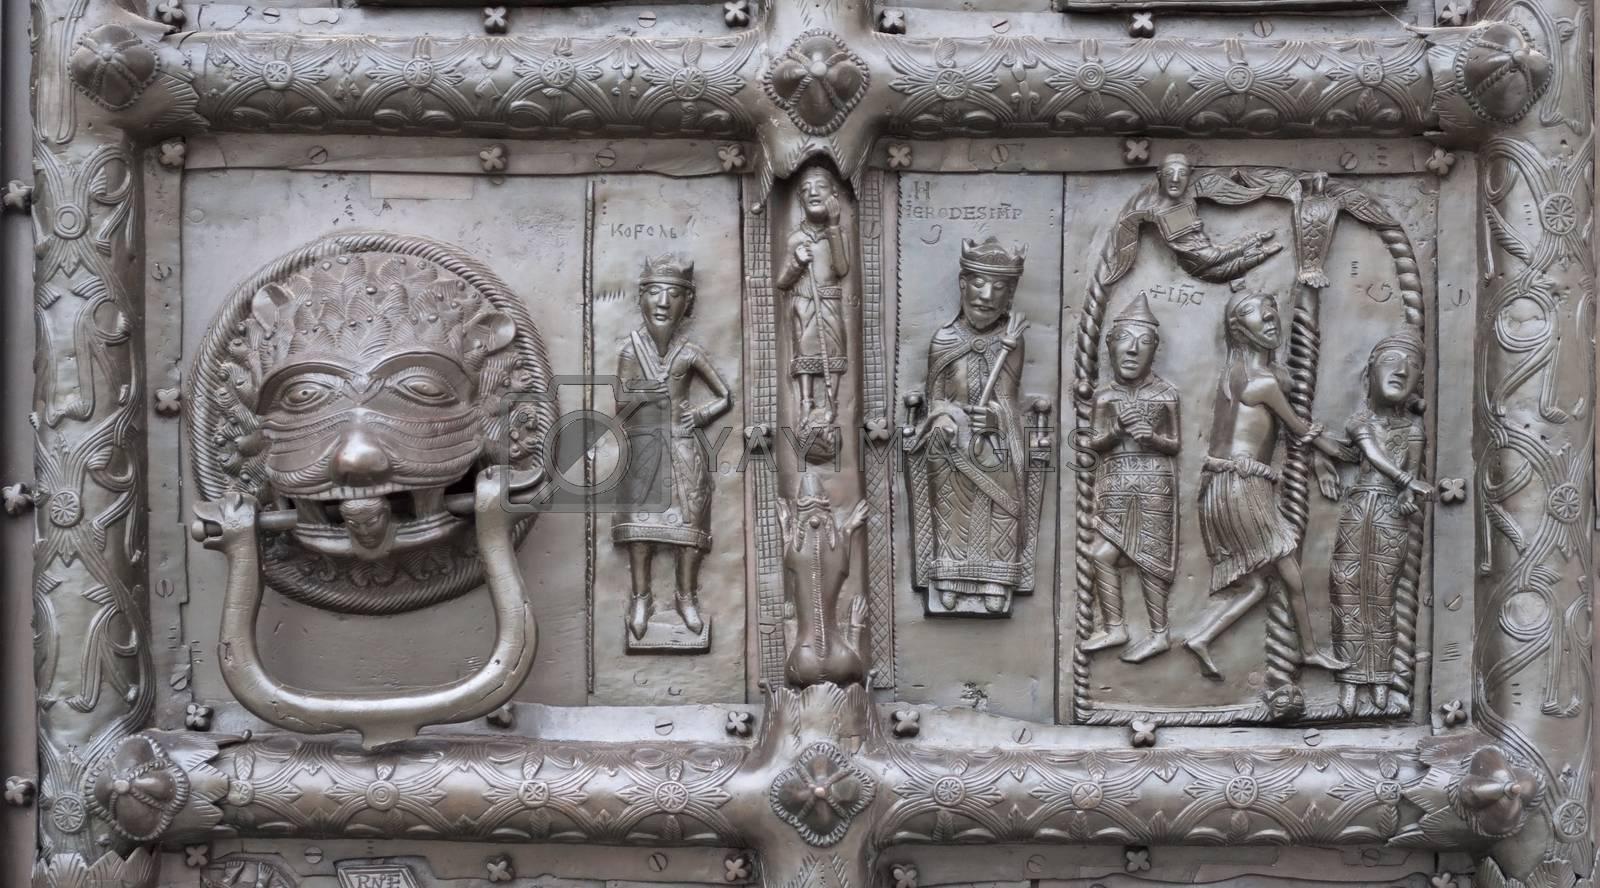 Door knocker of ancient bronze gates of Magdeburg in Veliky Novgorod, Russia. Fragment of bas-relief